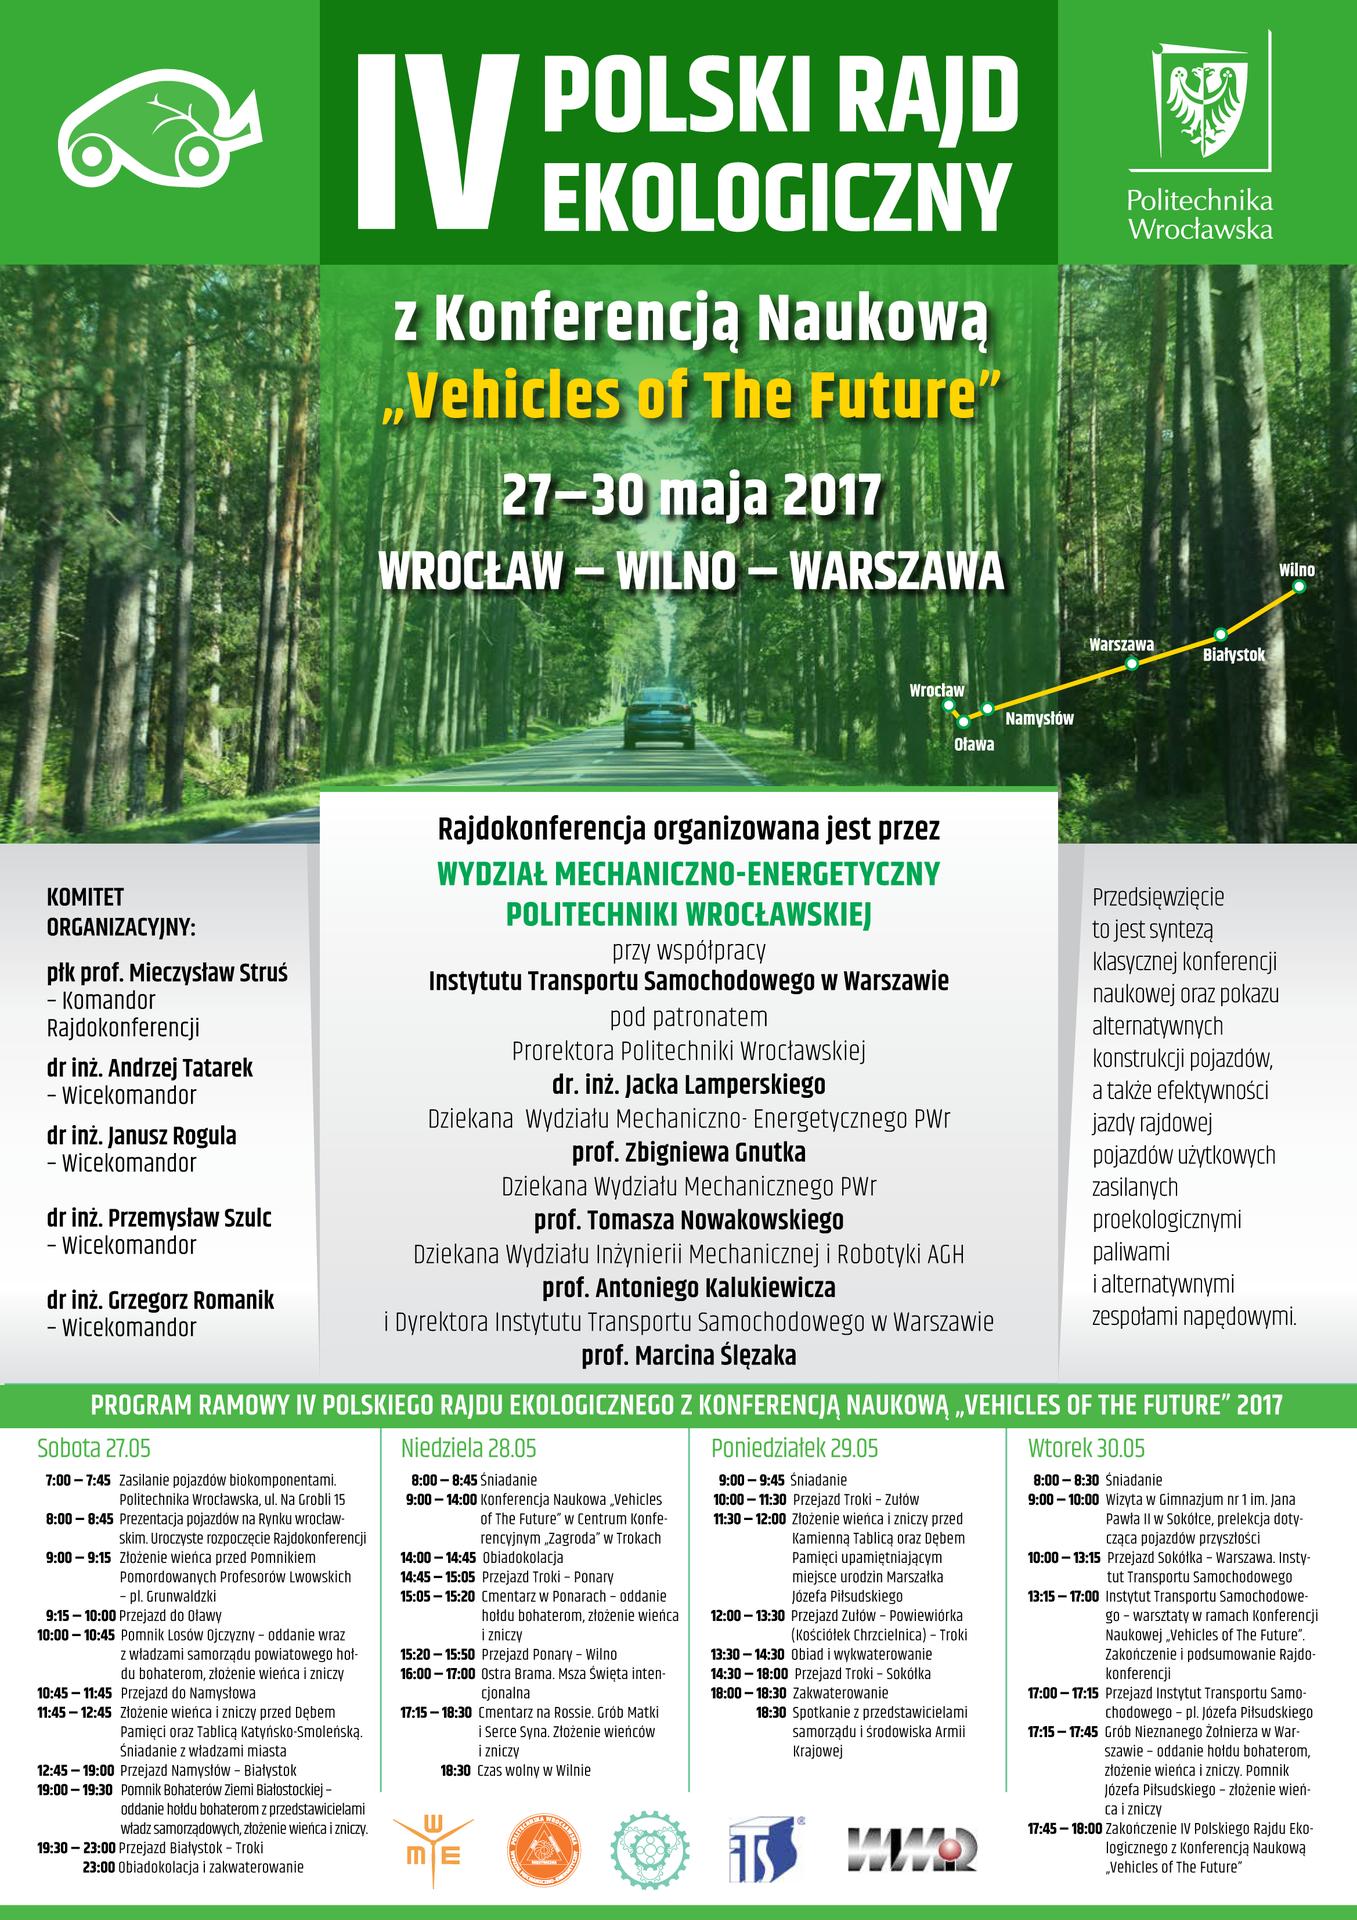 PLAKAT_Rajdokonferencja_2017-1-1.jpeg